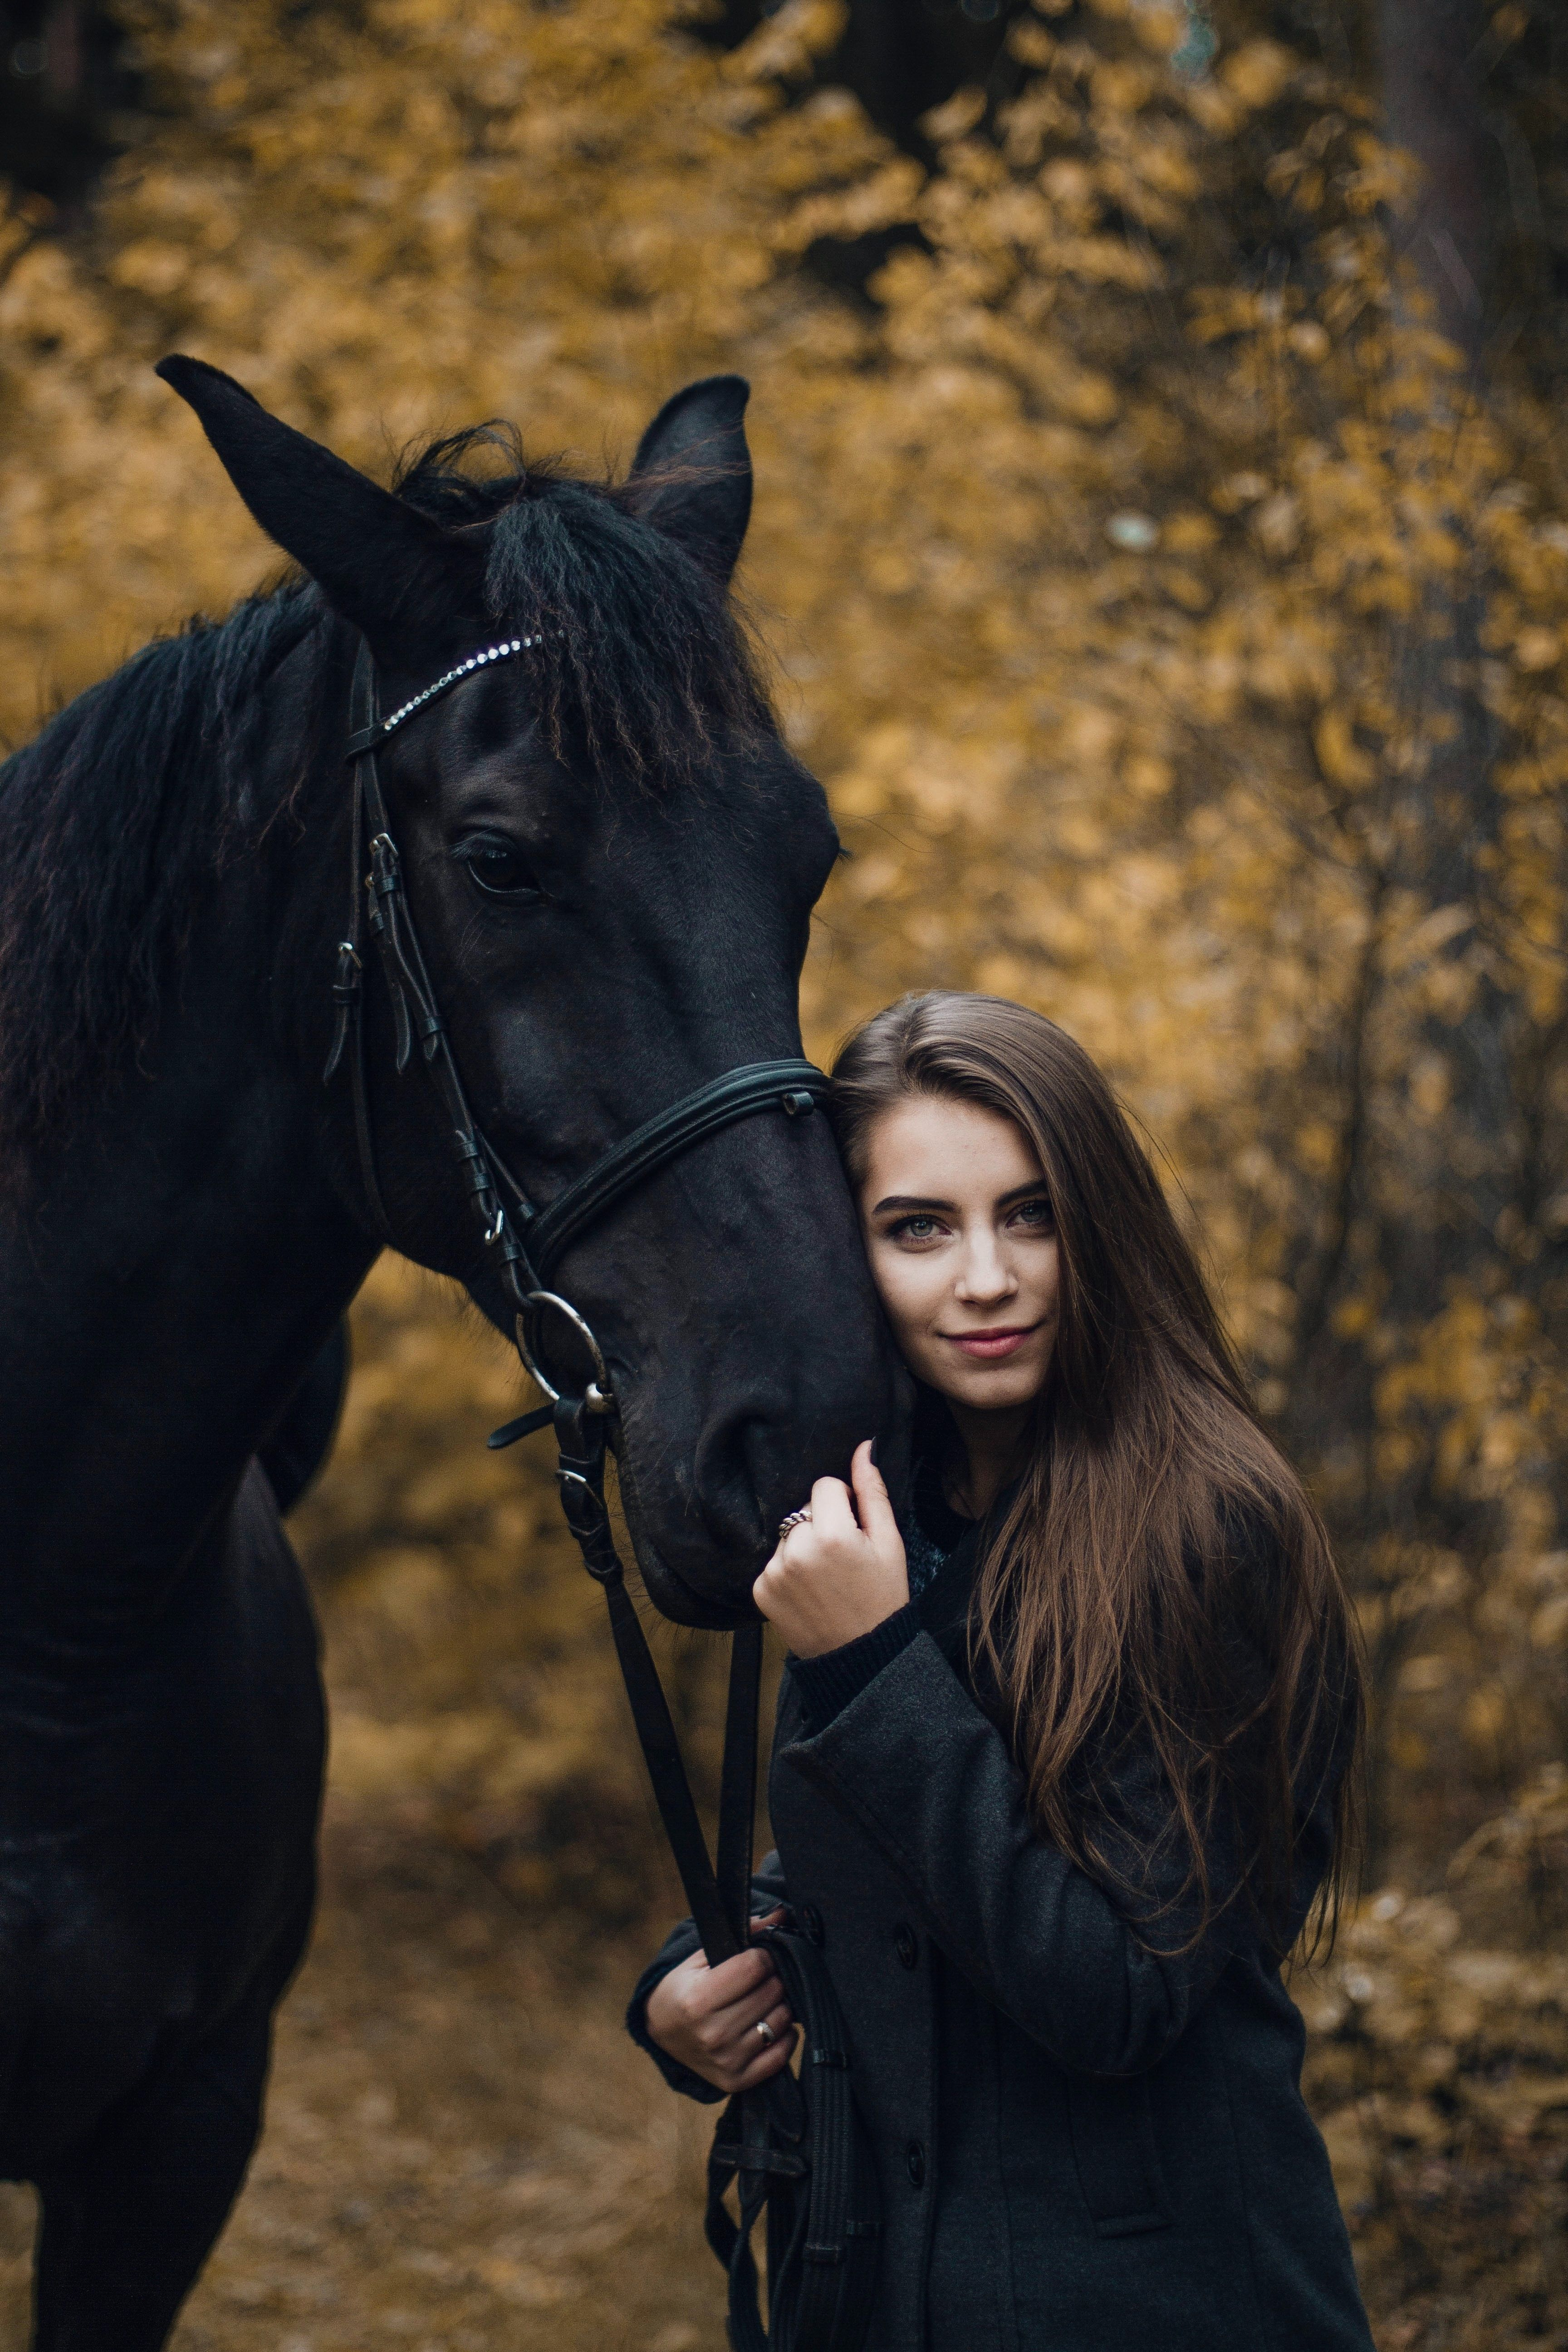 The Horse Course 102 | Horse girl photography, Horses ...